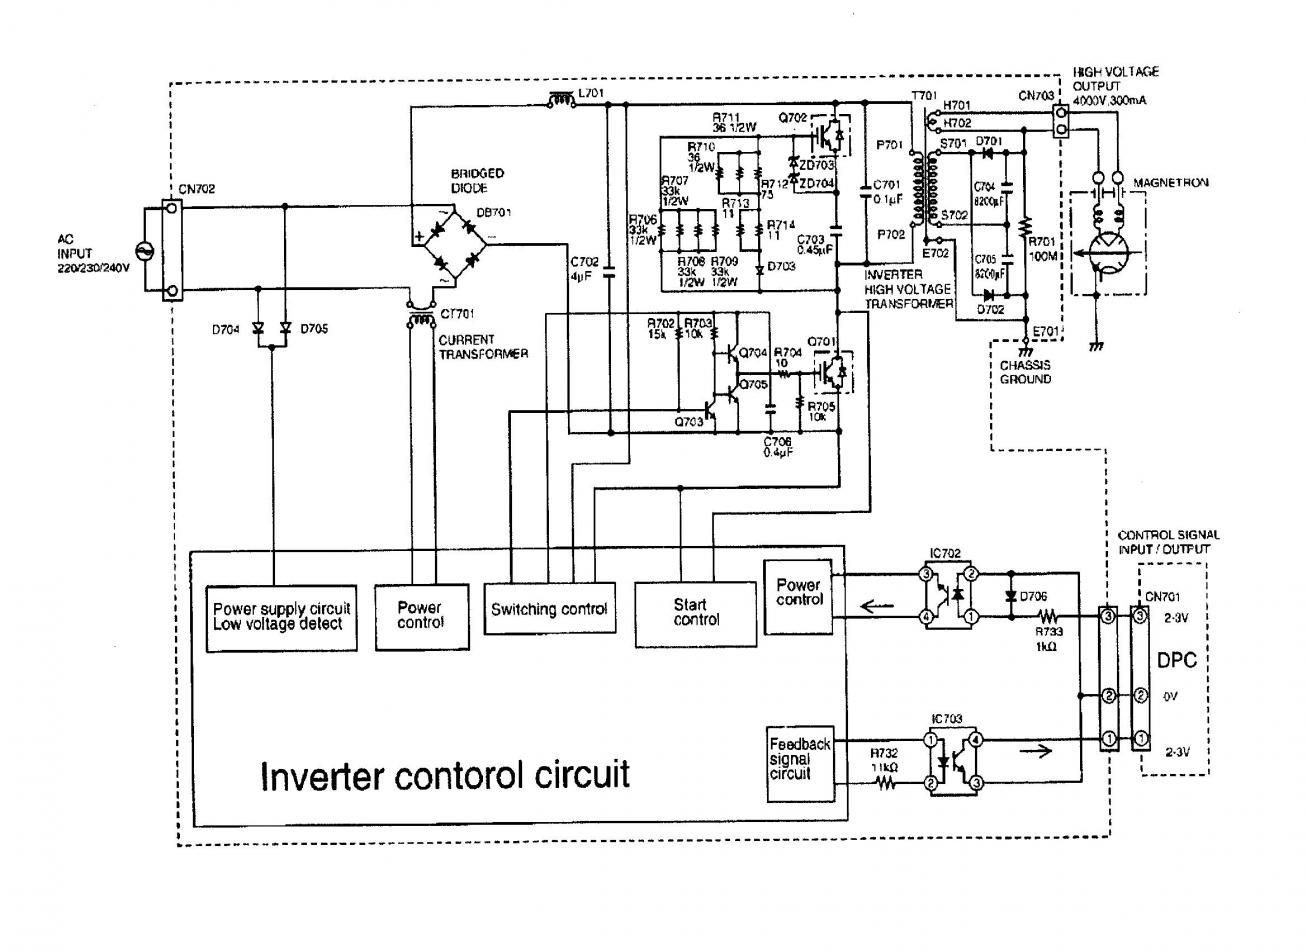 medium resolution of panasonic microwave schematic diagram wiring diagram toolbox panasonic microwave oven circuit diagram microwave oven schematic microwave